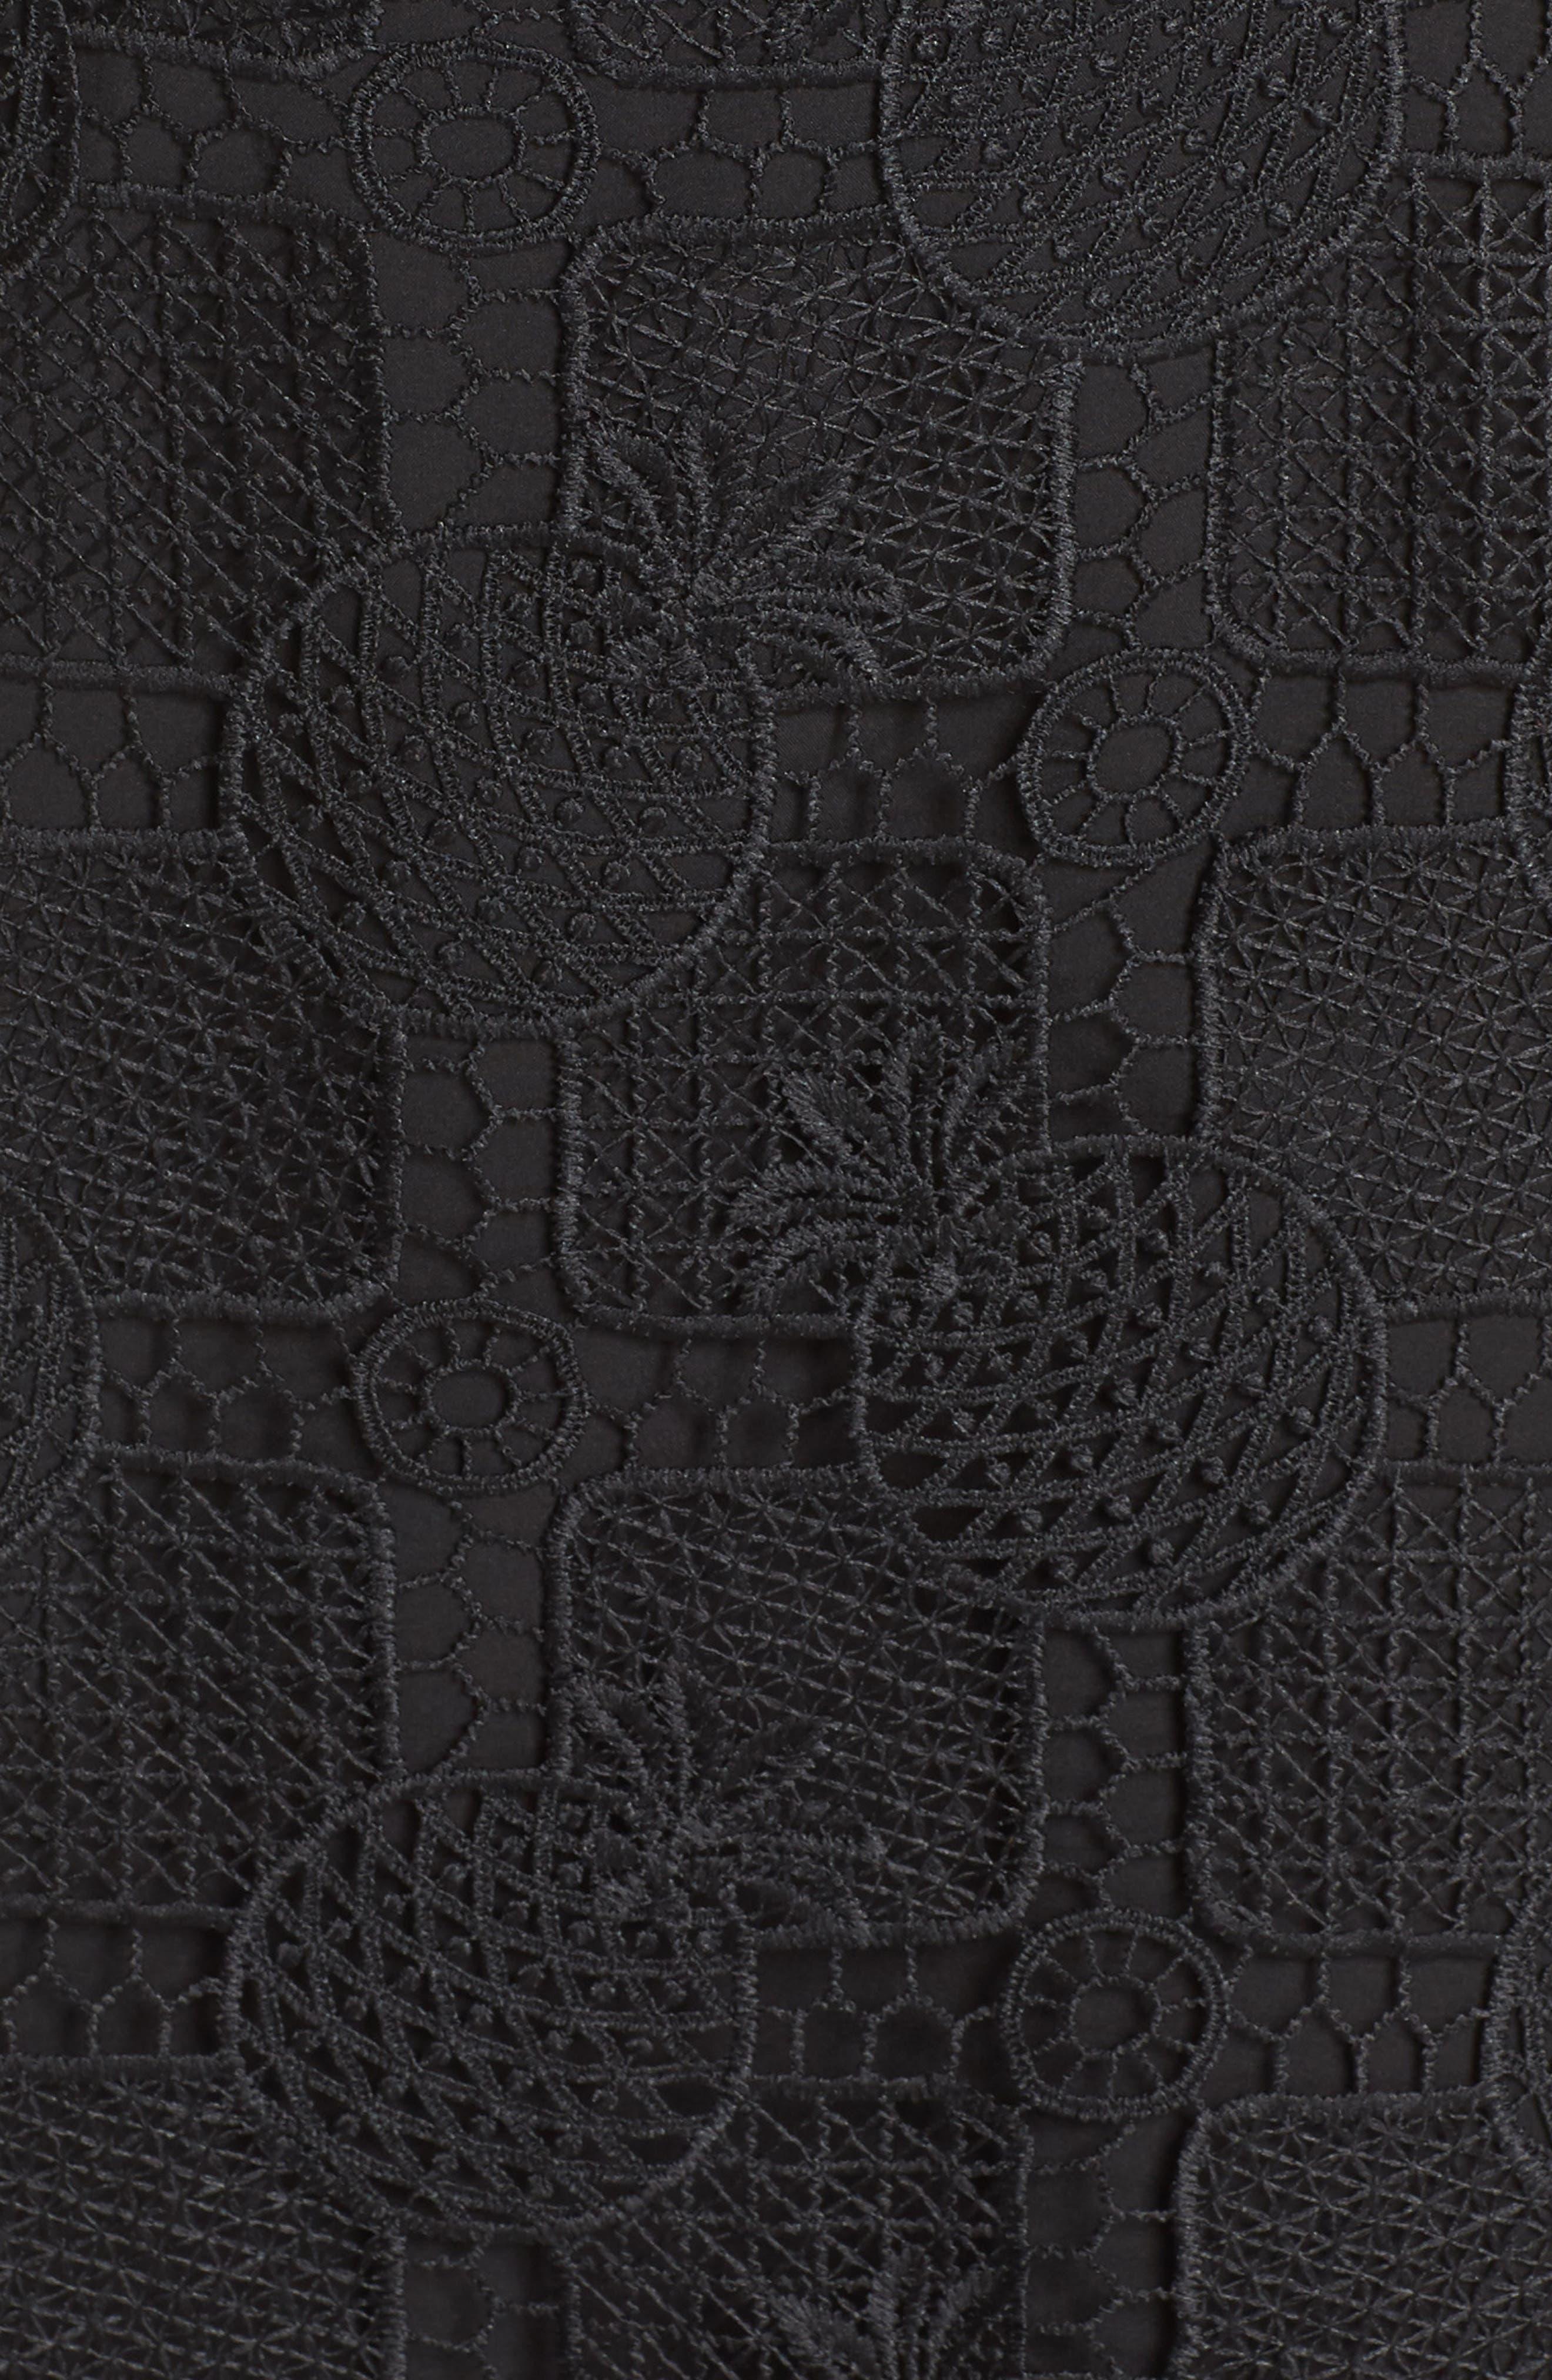 Strapless Lace Dress,                             Alternate thumbnail 5, color,                             Black